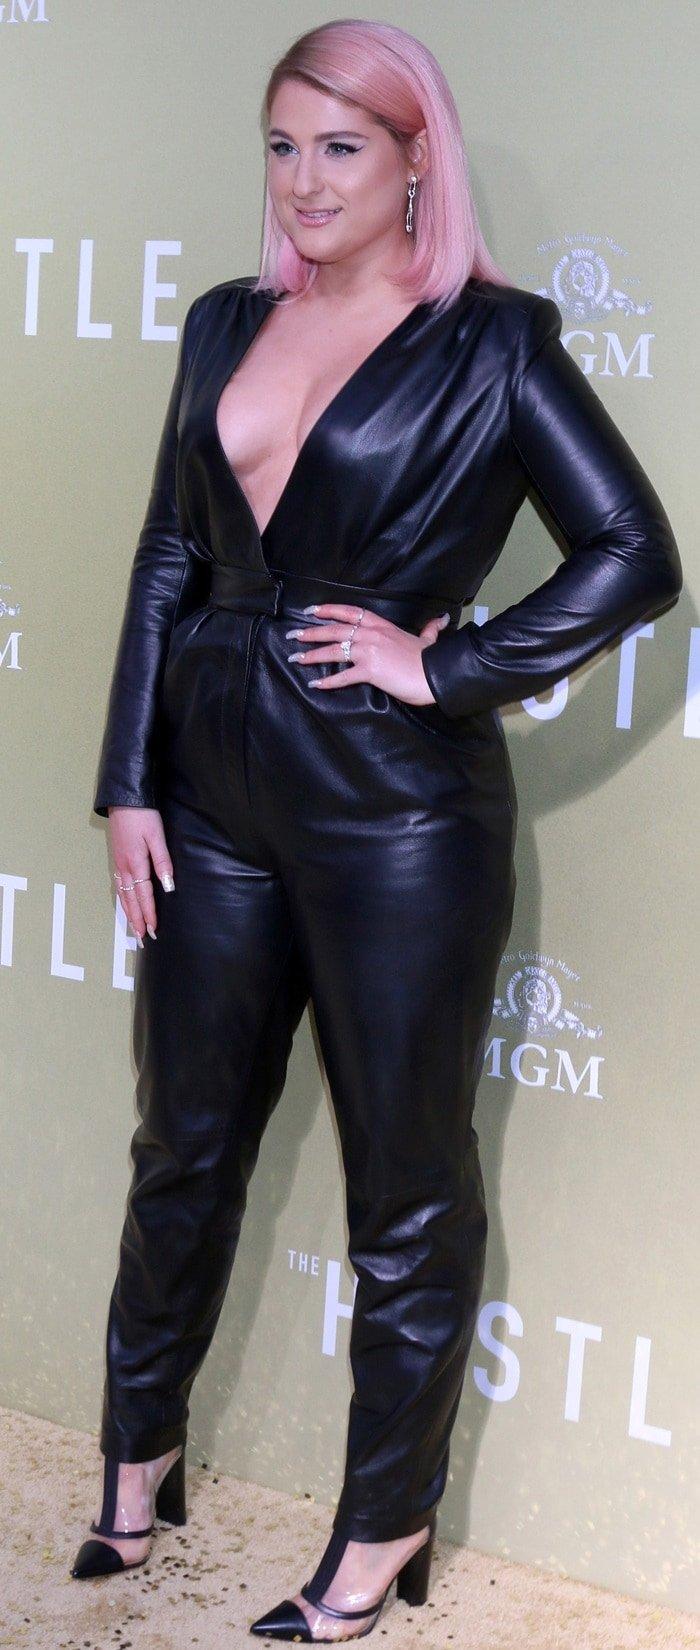 Meghan Trainor's jumpsuit features a revealing v-neck